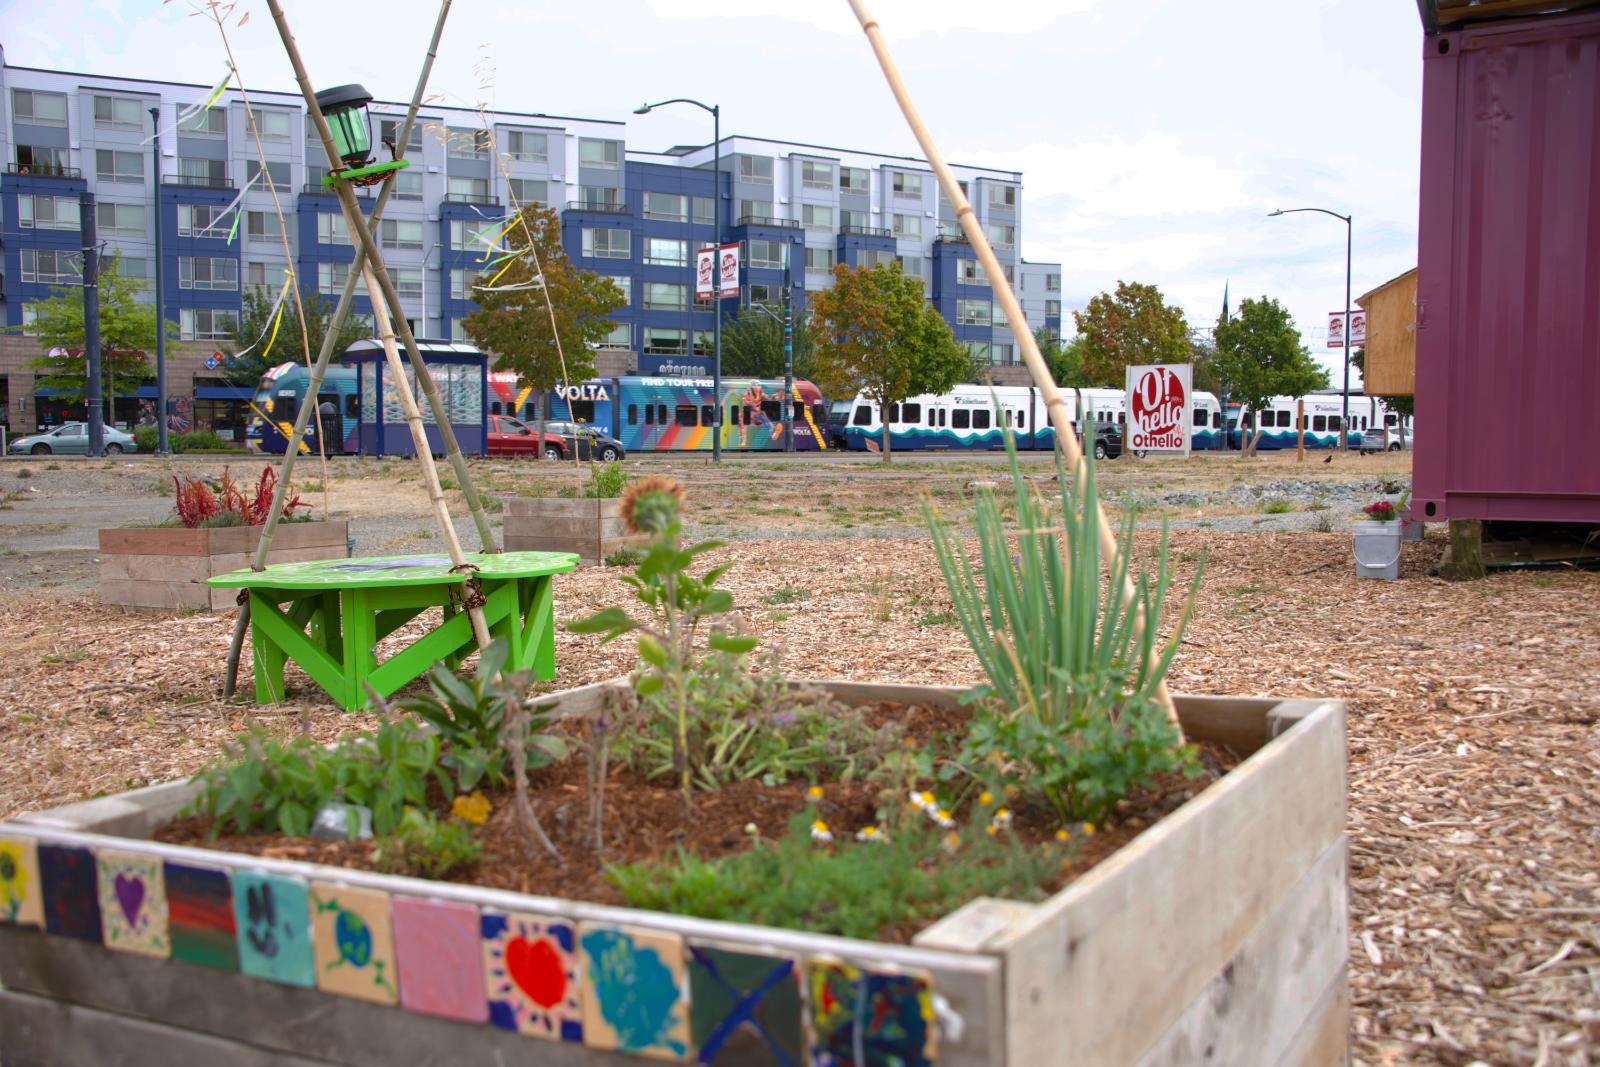 The Beet Box community garden